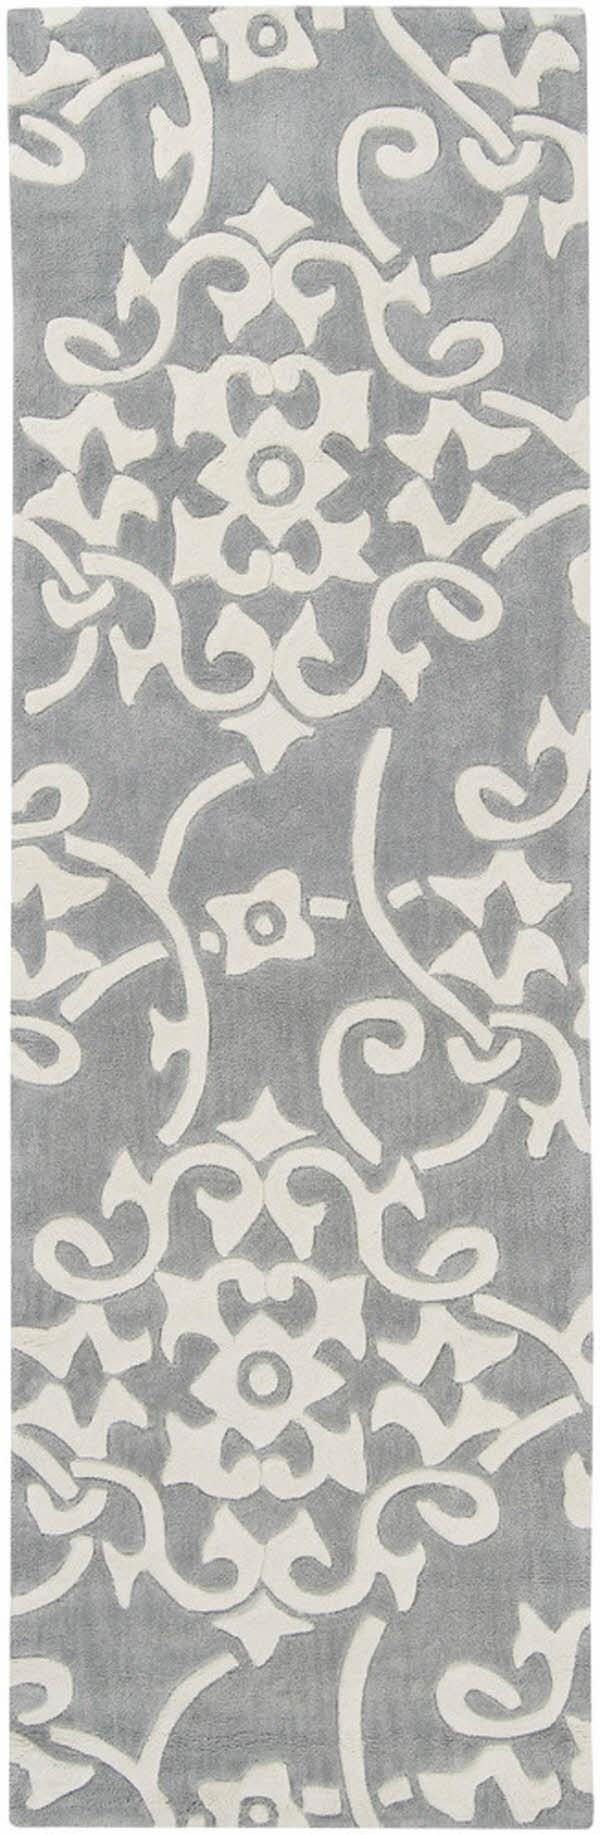 Silver Gray Damask Area Rug